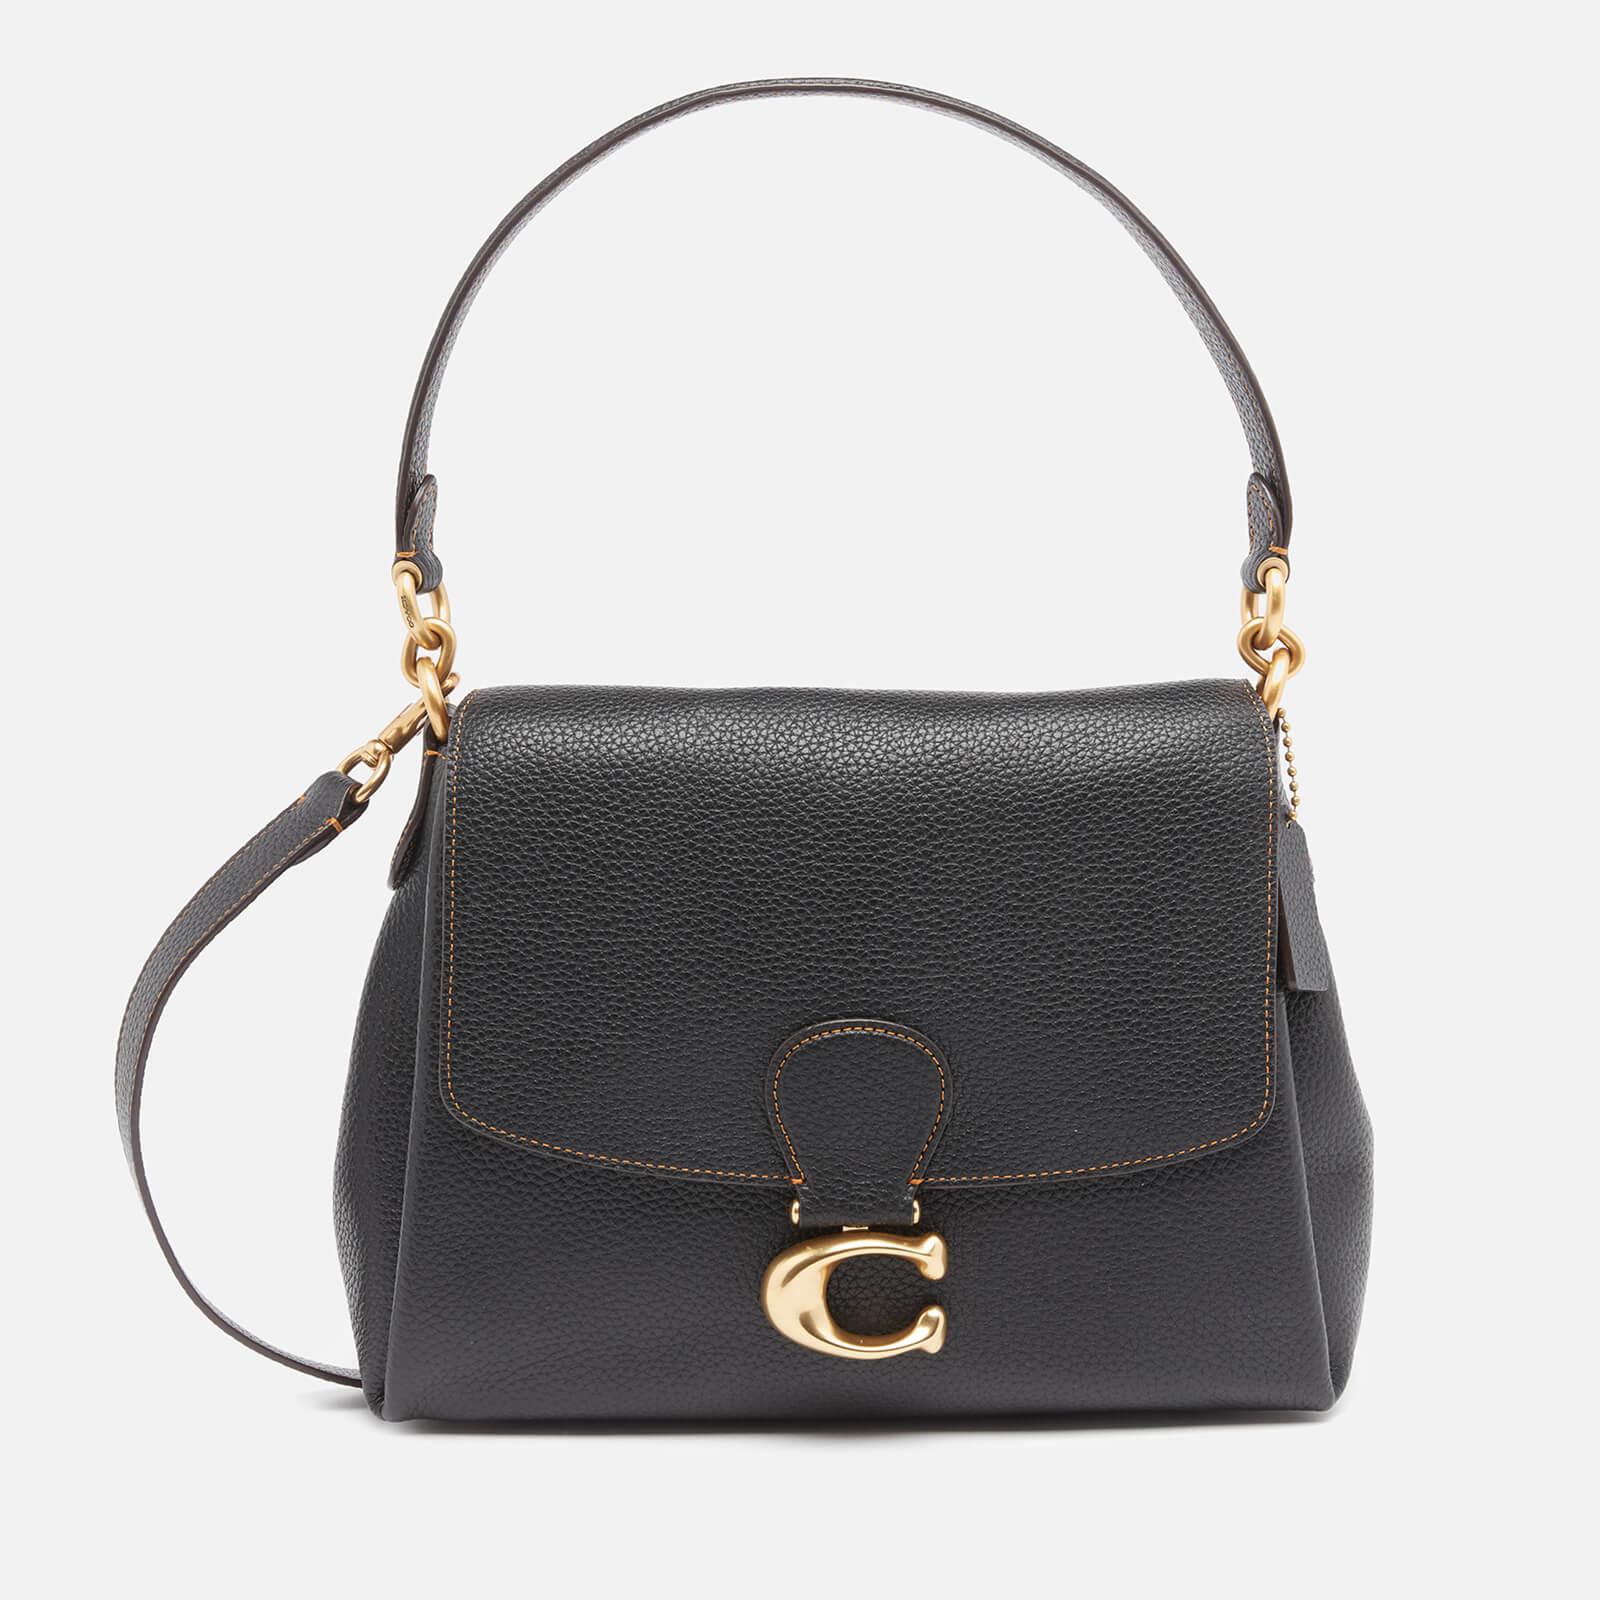 Coach Women's May Shoulder Bag - Black